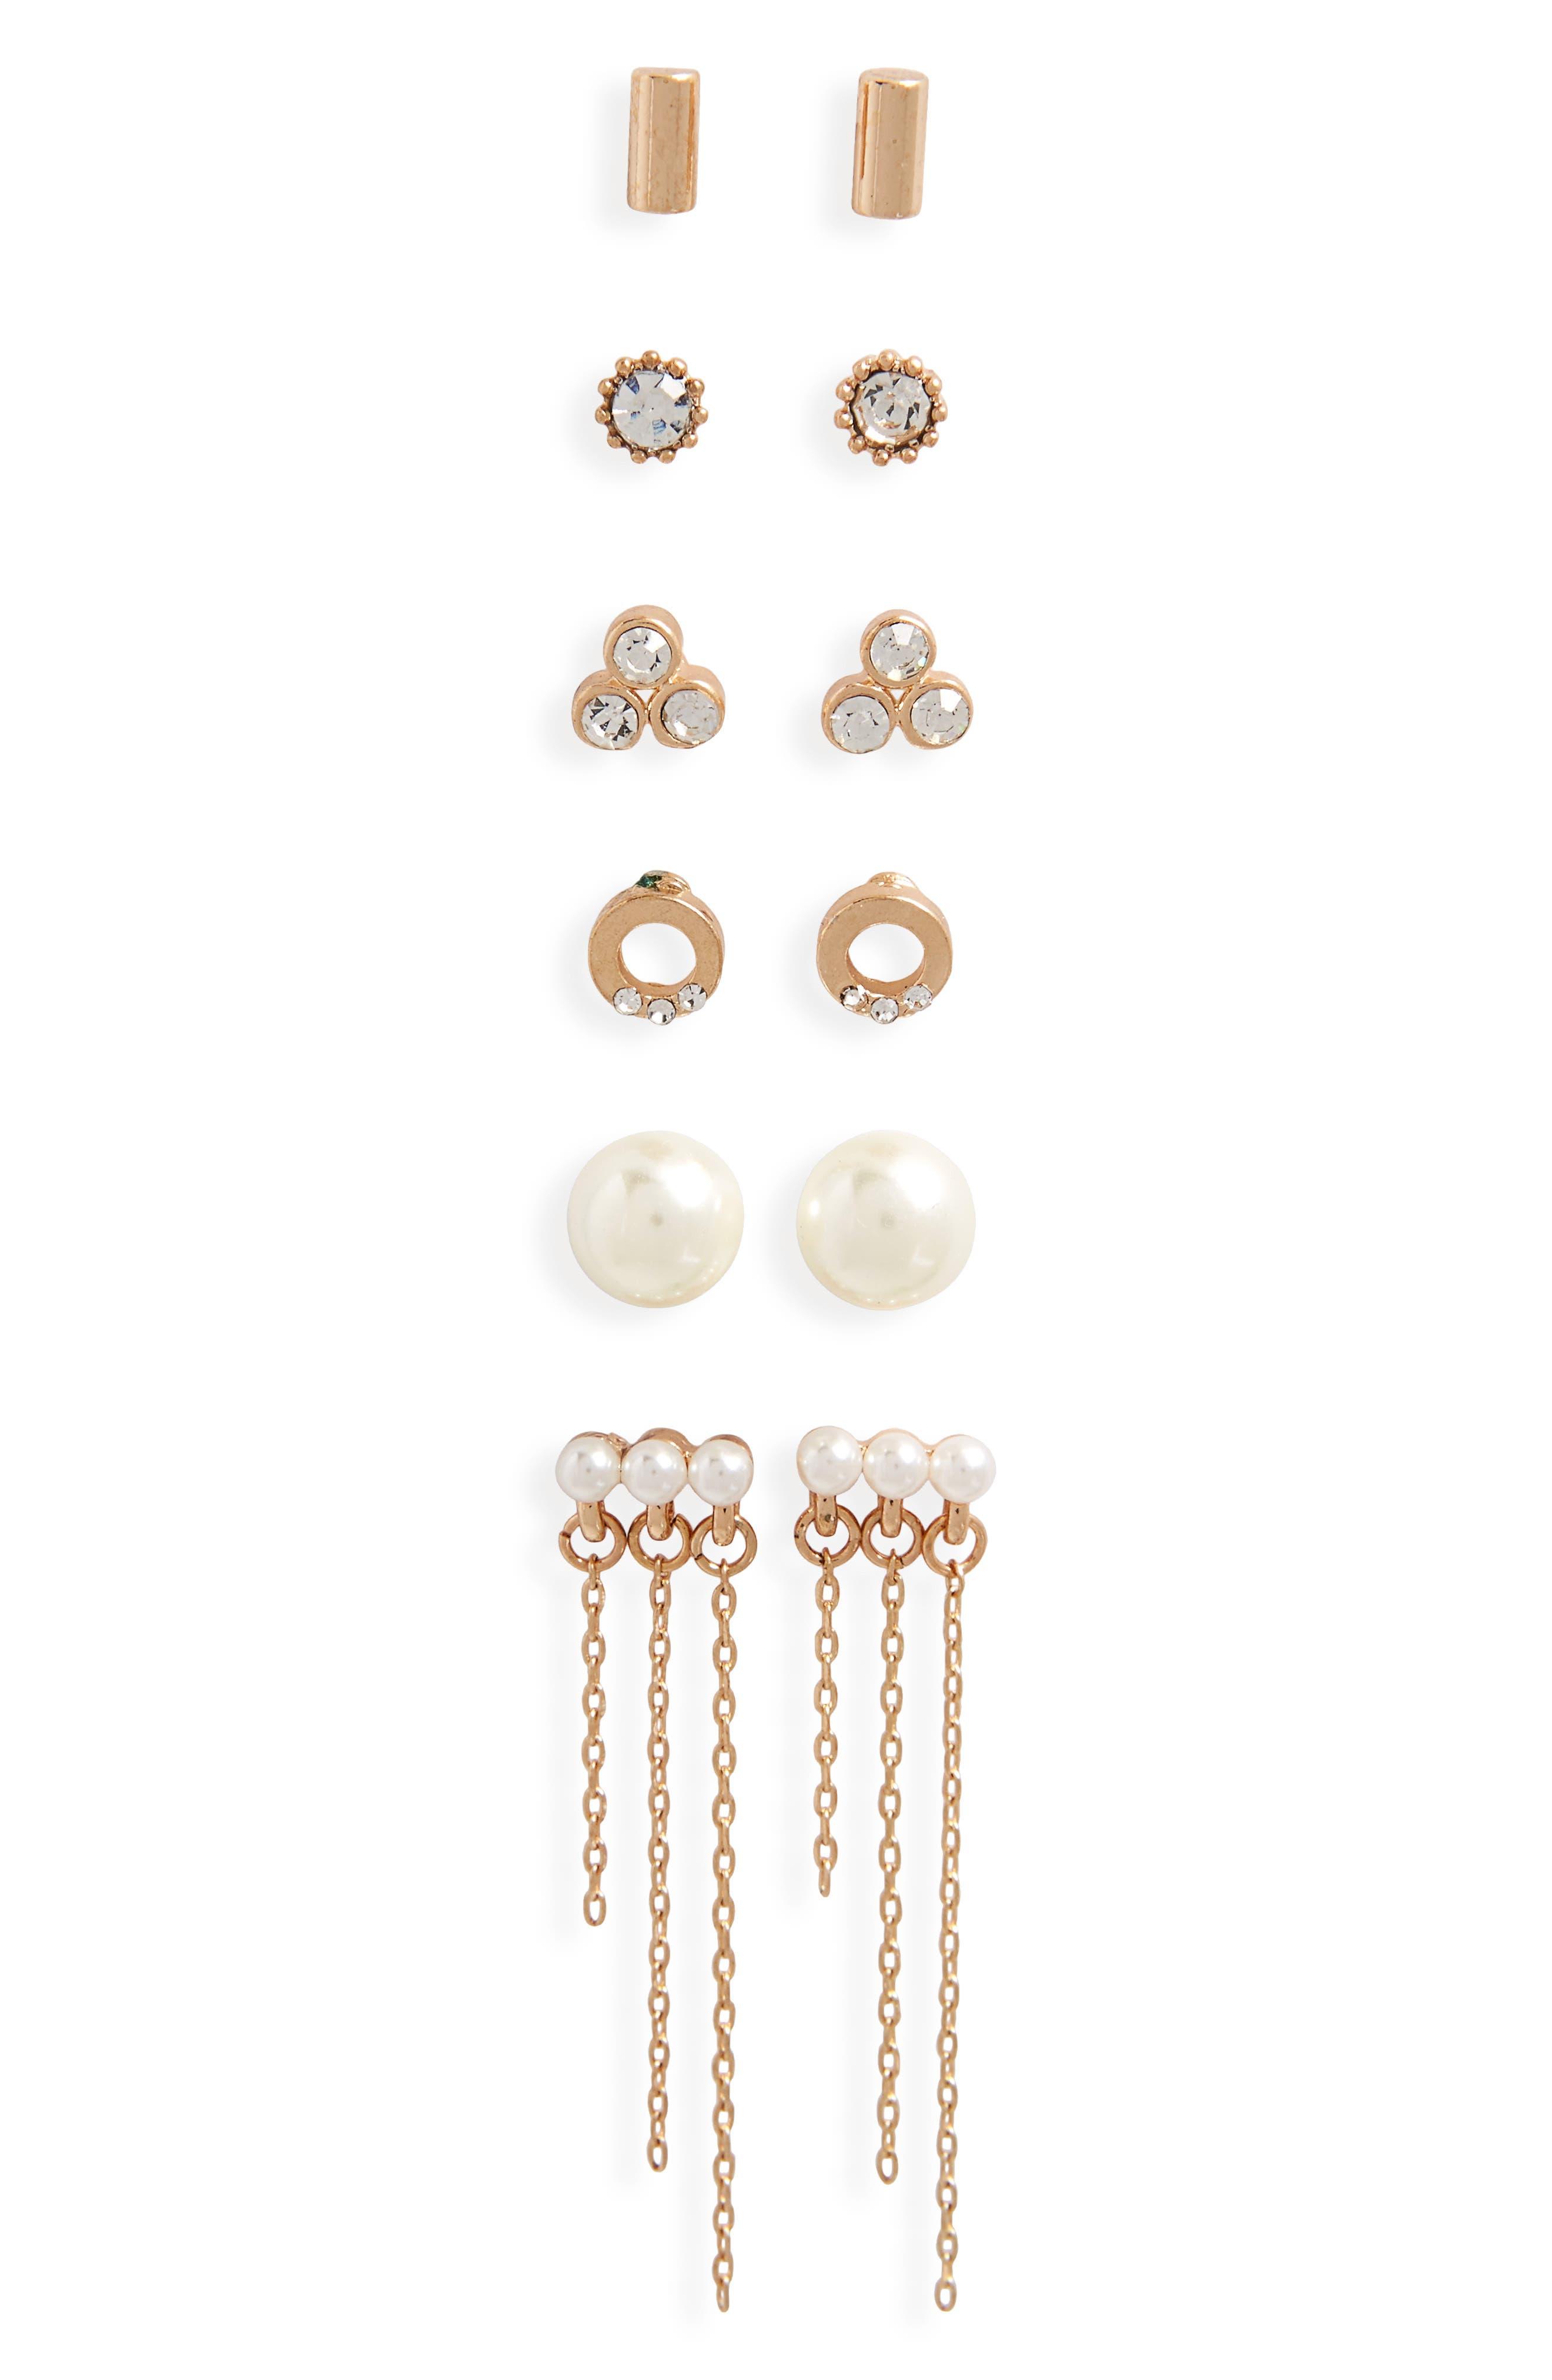 Main Image - BP. 6-Pack Imitation Pearl & Crystal Earrings